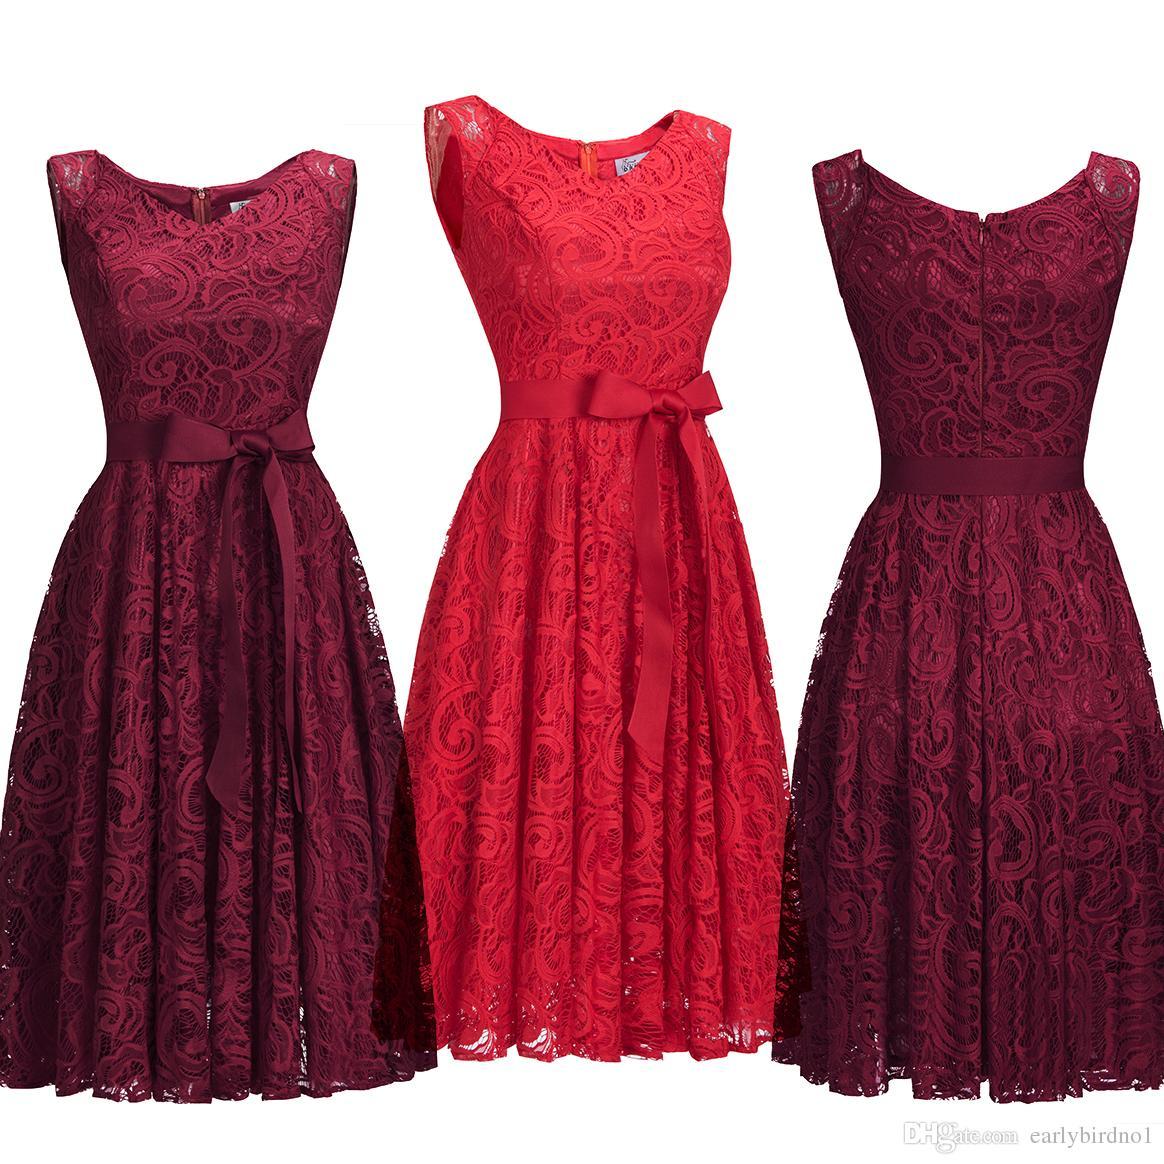 04b88321c58e8 2019 Designer Red Burgundy Lace Evening Dresses Knee Length V Neck Sash Cocktail  Party Dress Formal Occasion Wear CPS1147 Black Dress Long Buy Gowns Online  ...